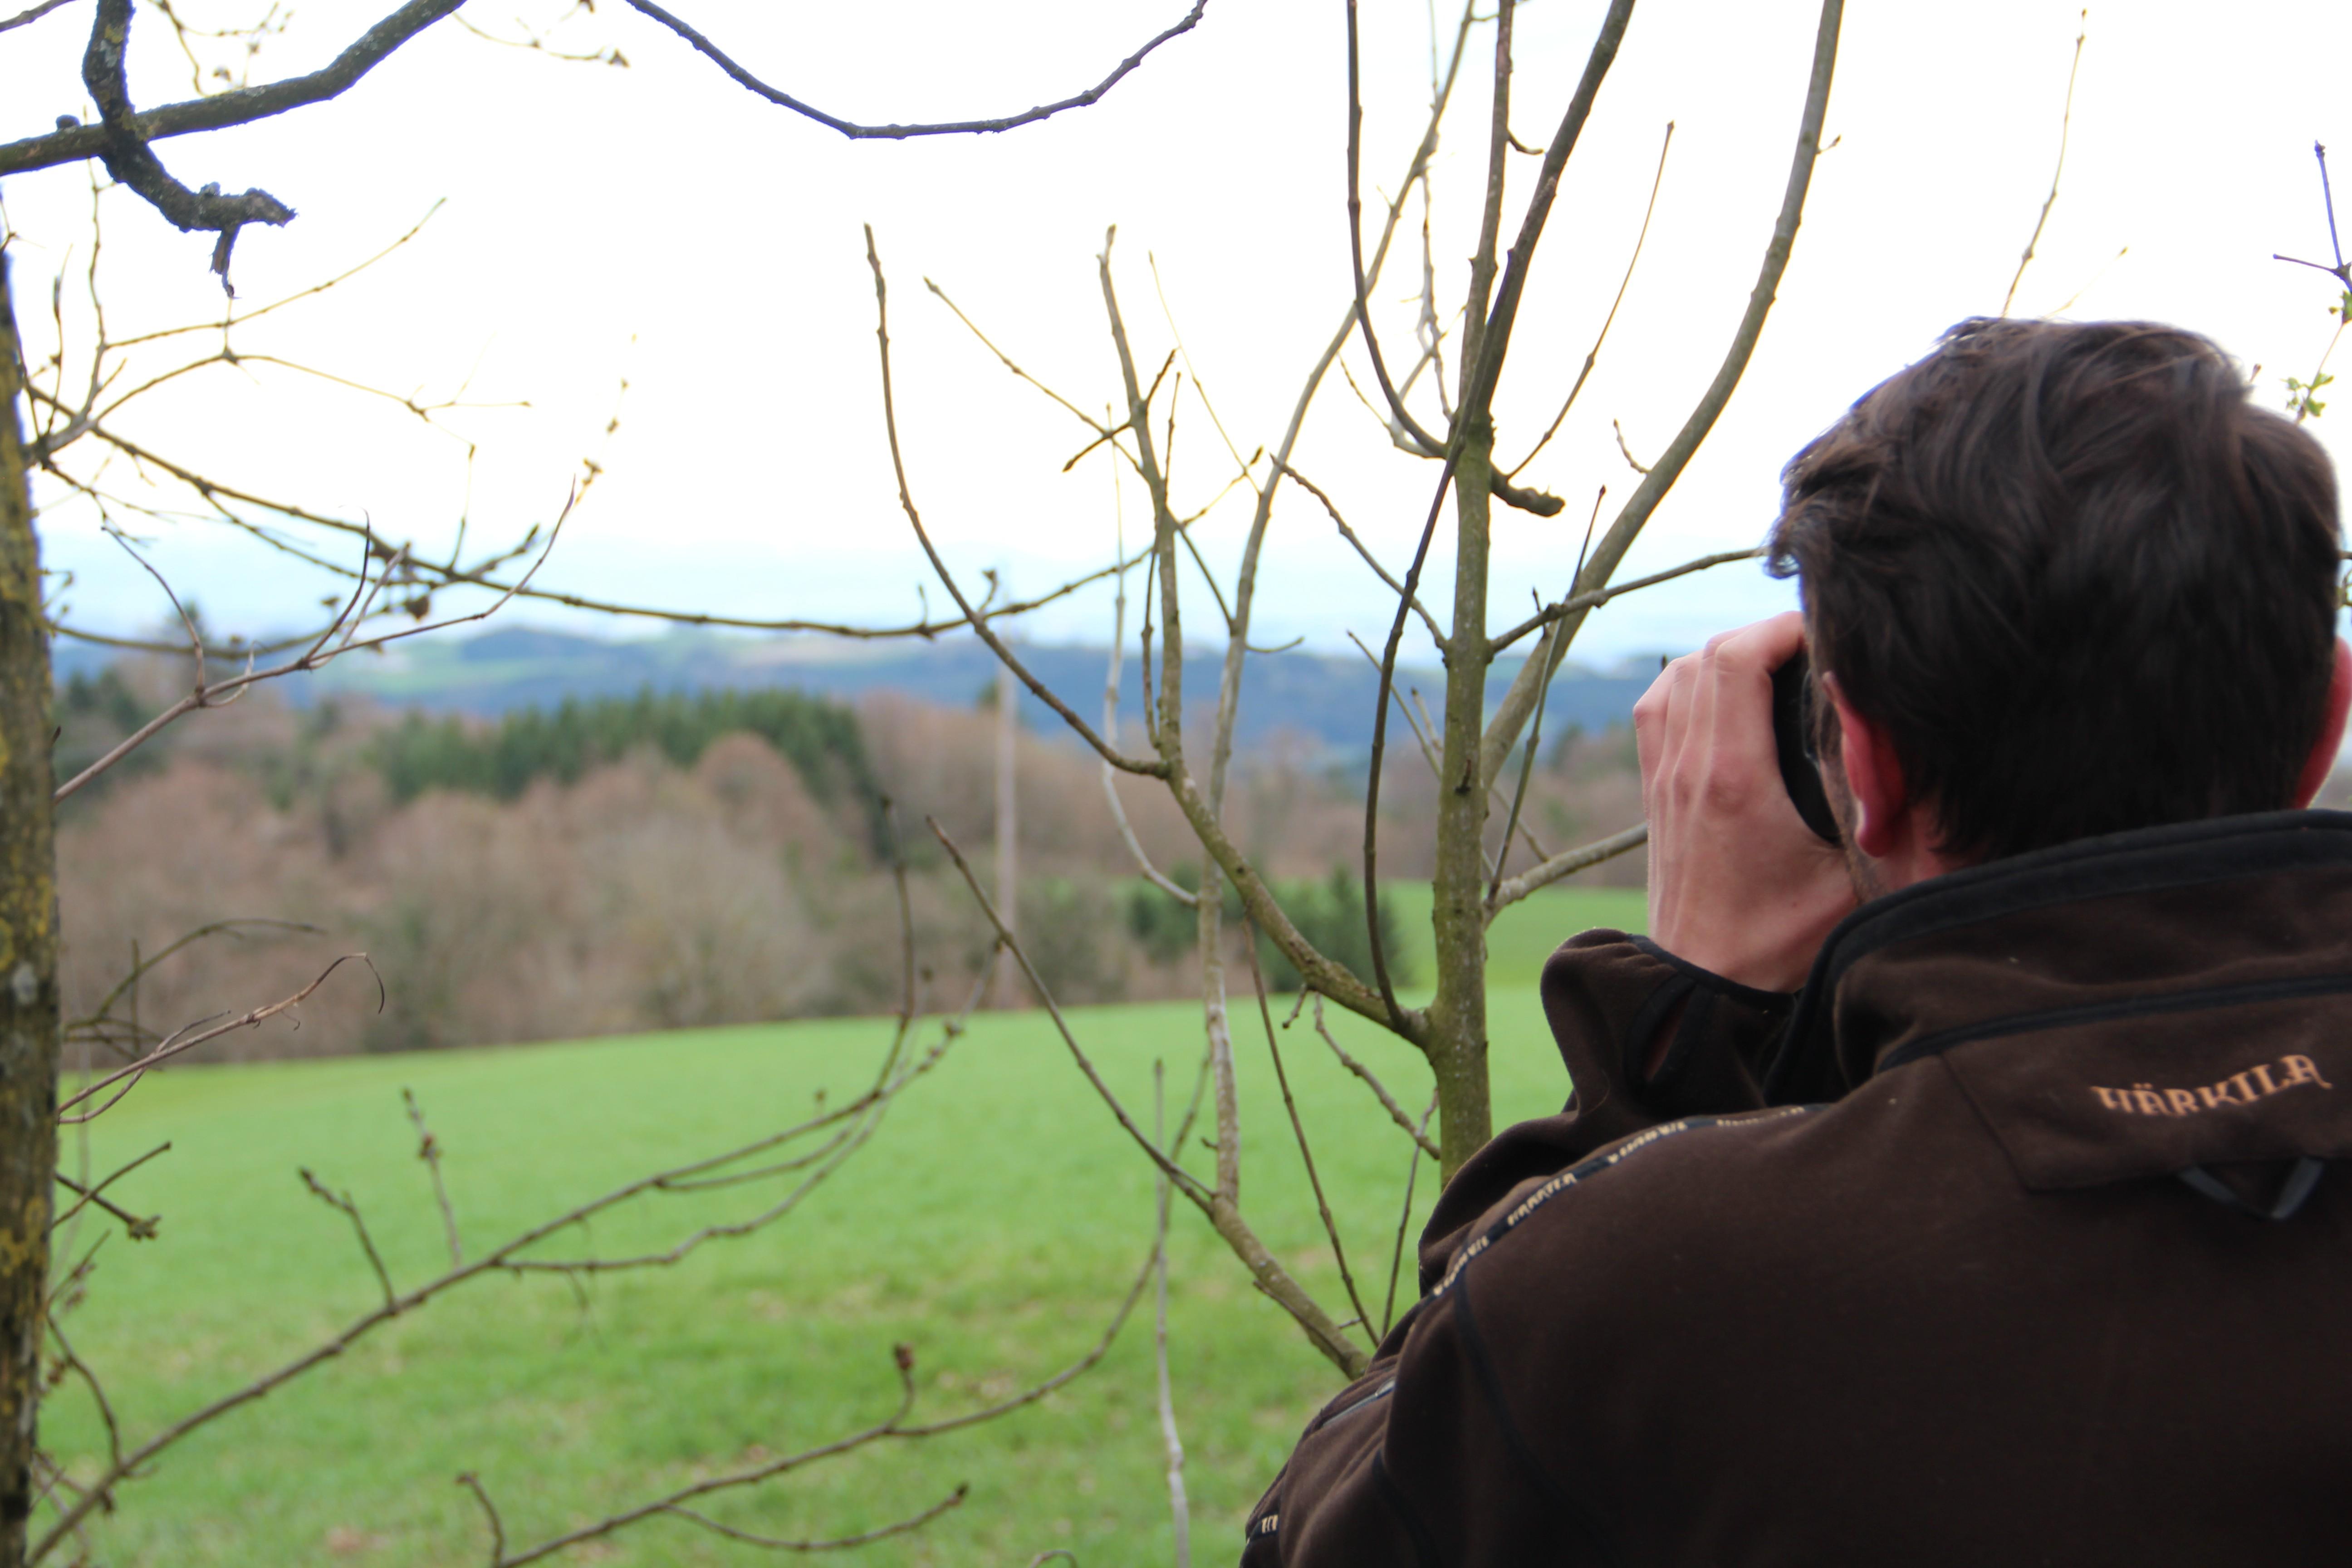 Entfernungsmesser Jagd Im Test : Entfernungsmesser jagd test u erx i tbr